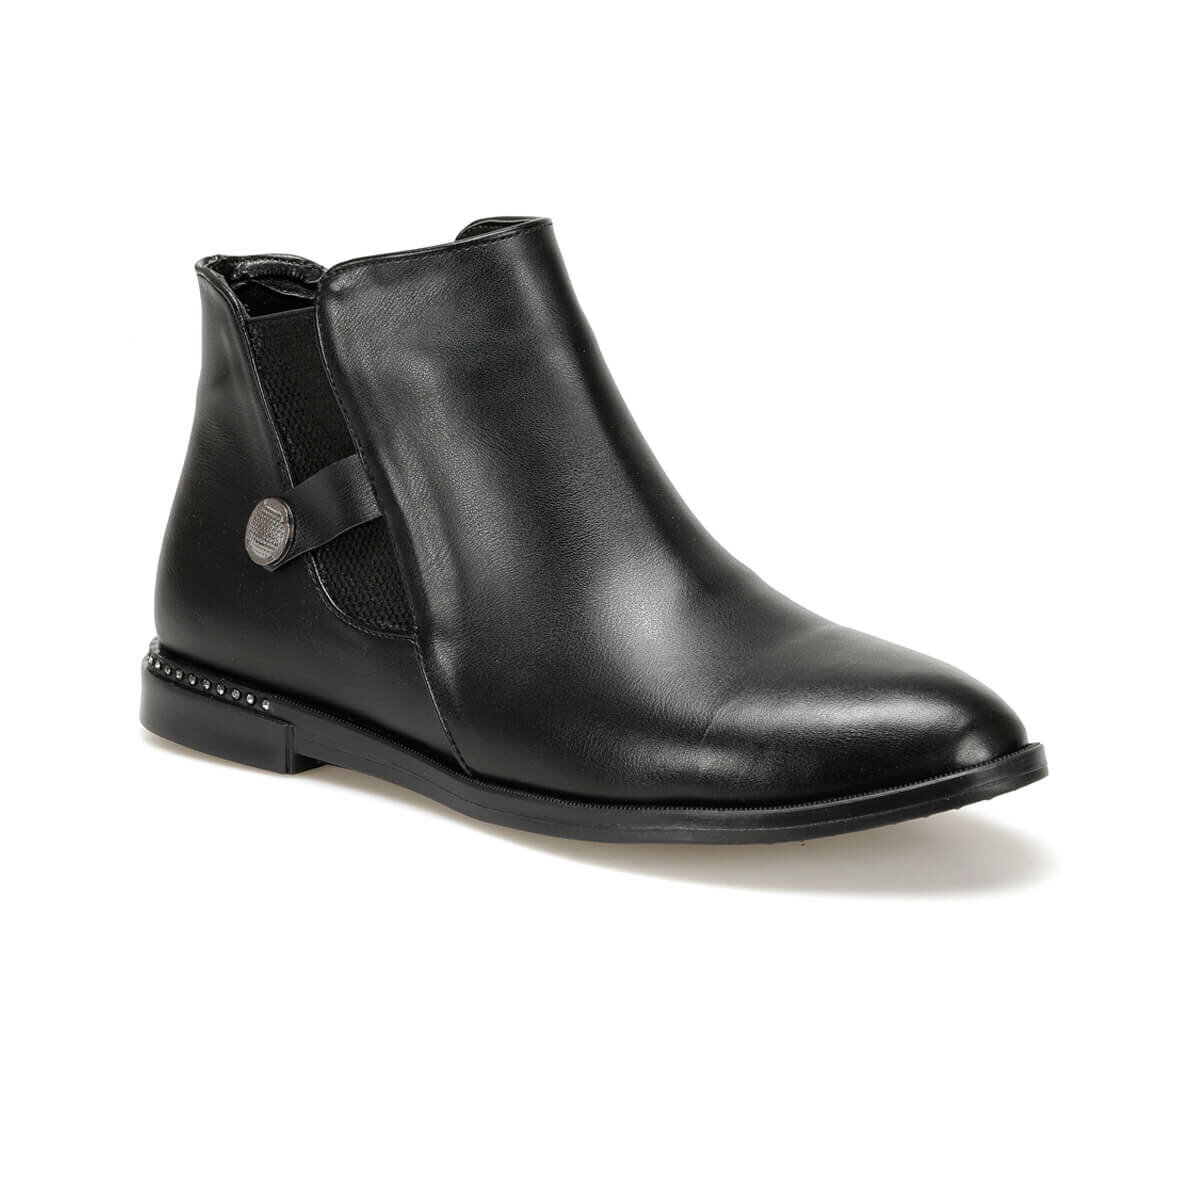 FLO MARC85Z SKIN Black Women Boots BUTIGO